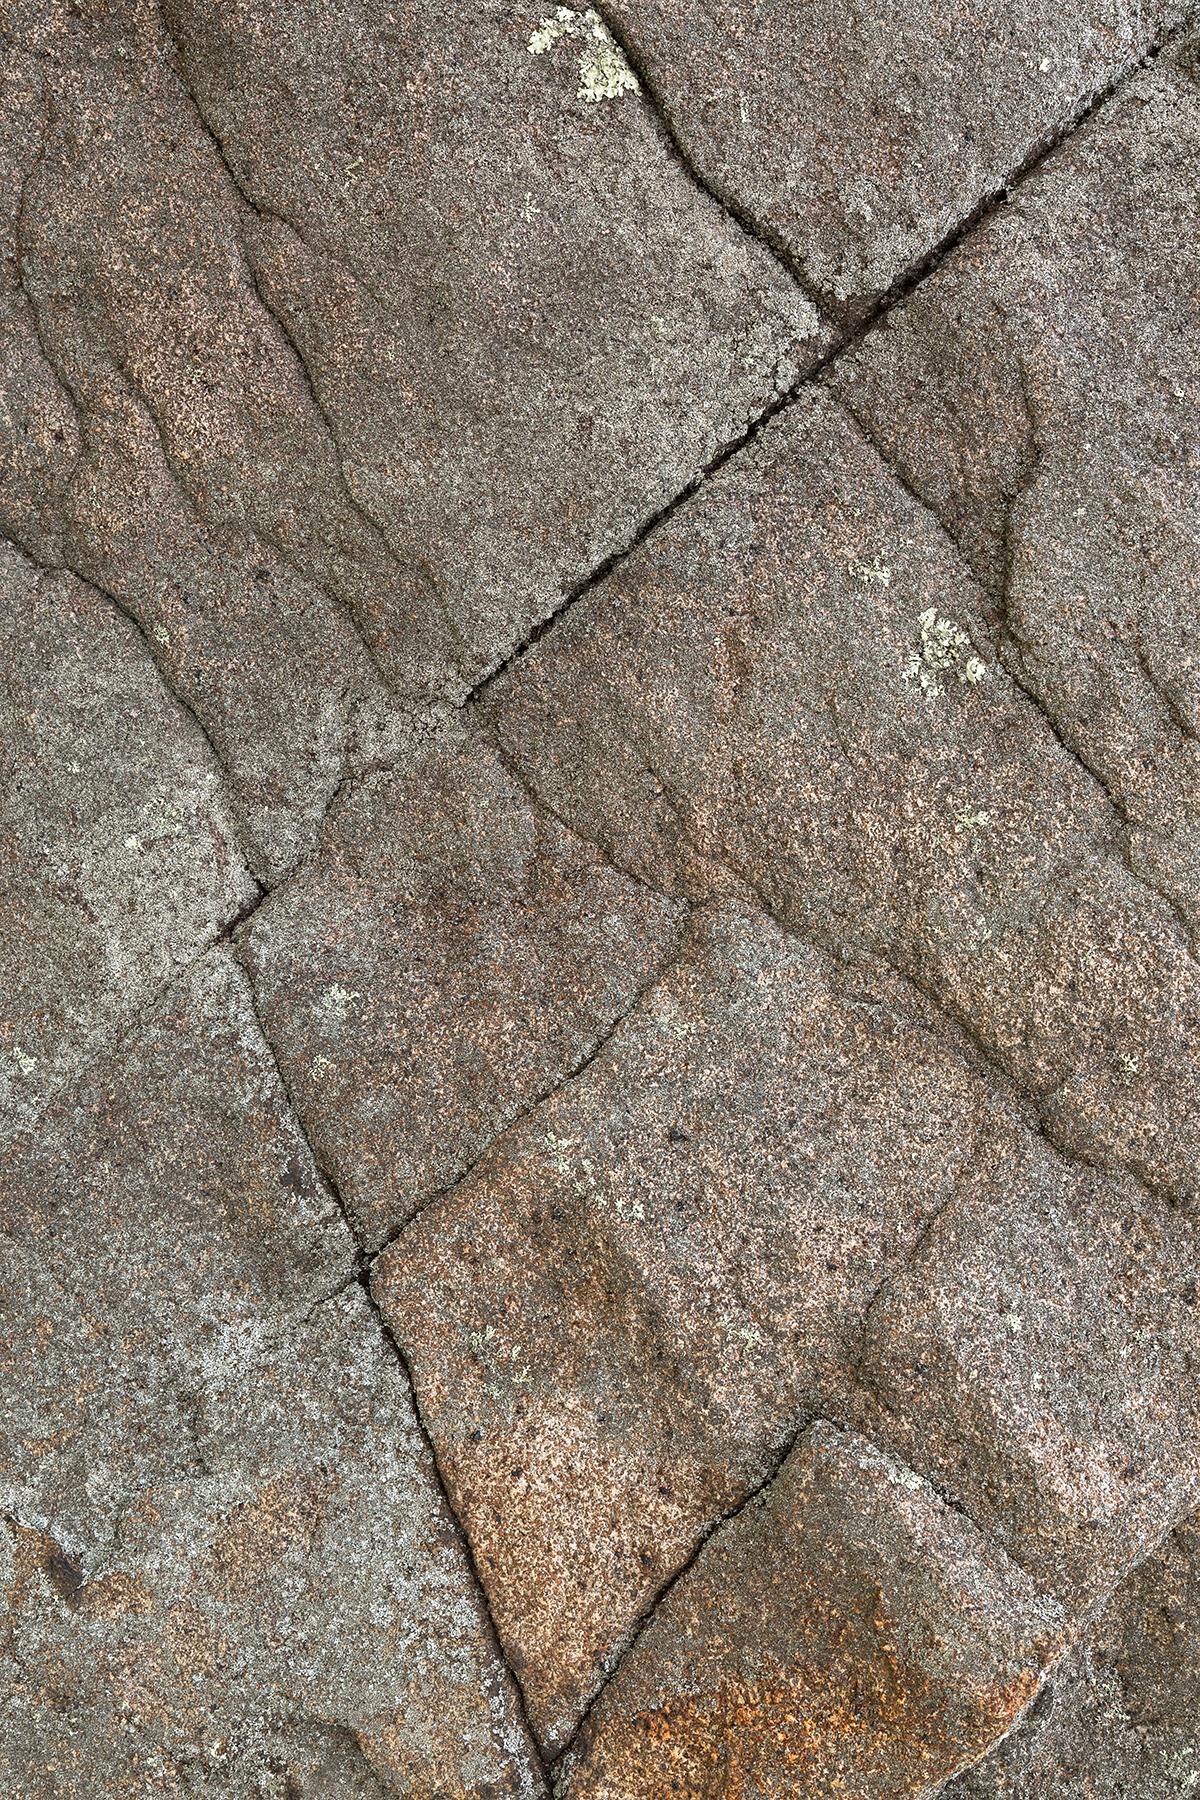 Cracked Stone - HDR Texture, Backdrop, Raw, Somadjinn, Slanting, HQ Photo